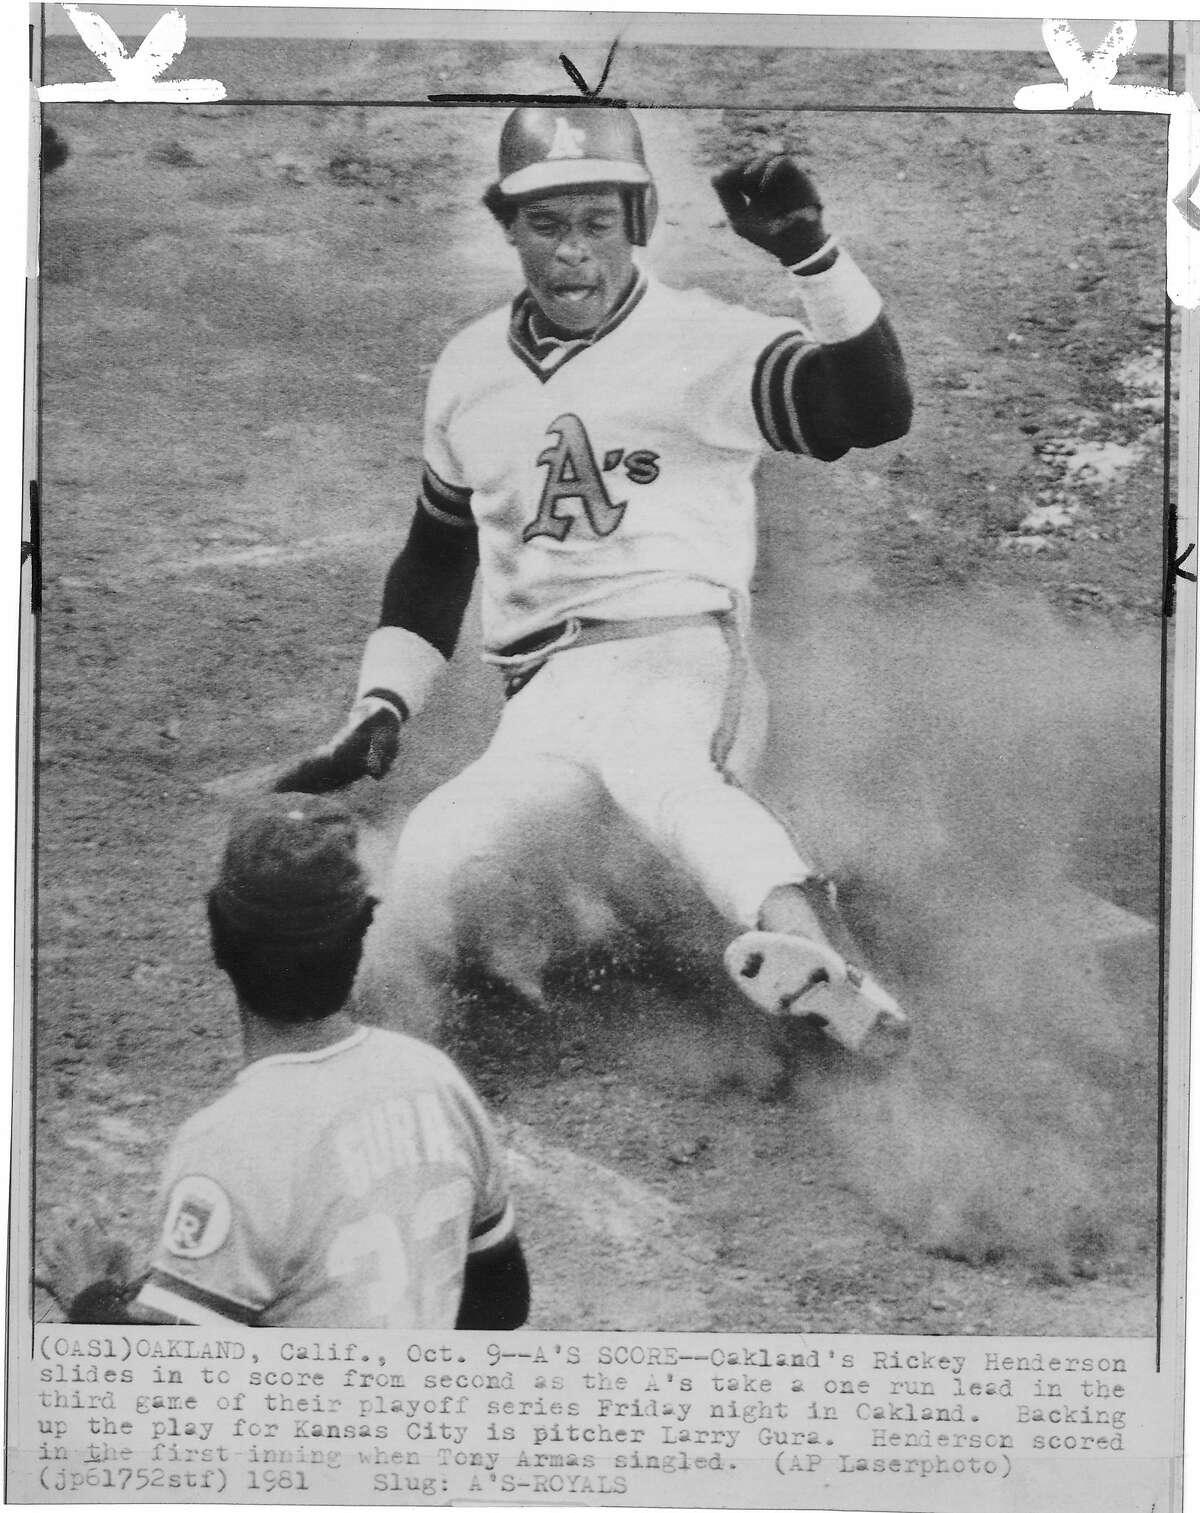 1981 Oakland Athletics Record through 15 games: 14-1 Season record: 64-45 Season result: Won AL West, lost in ALCS to New York Yankees